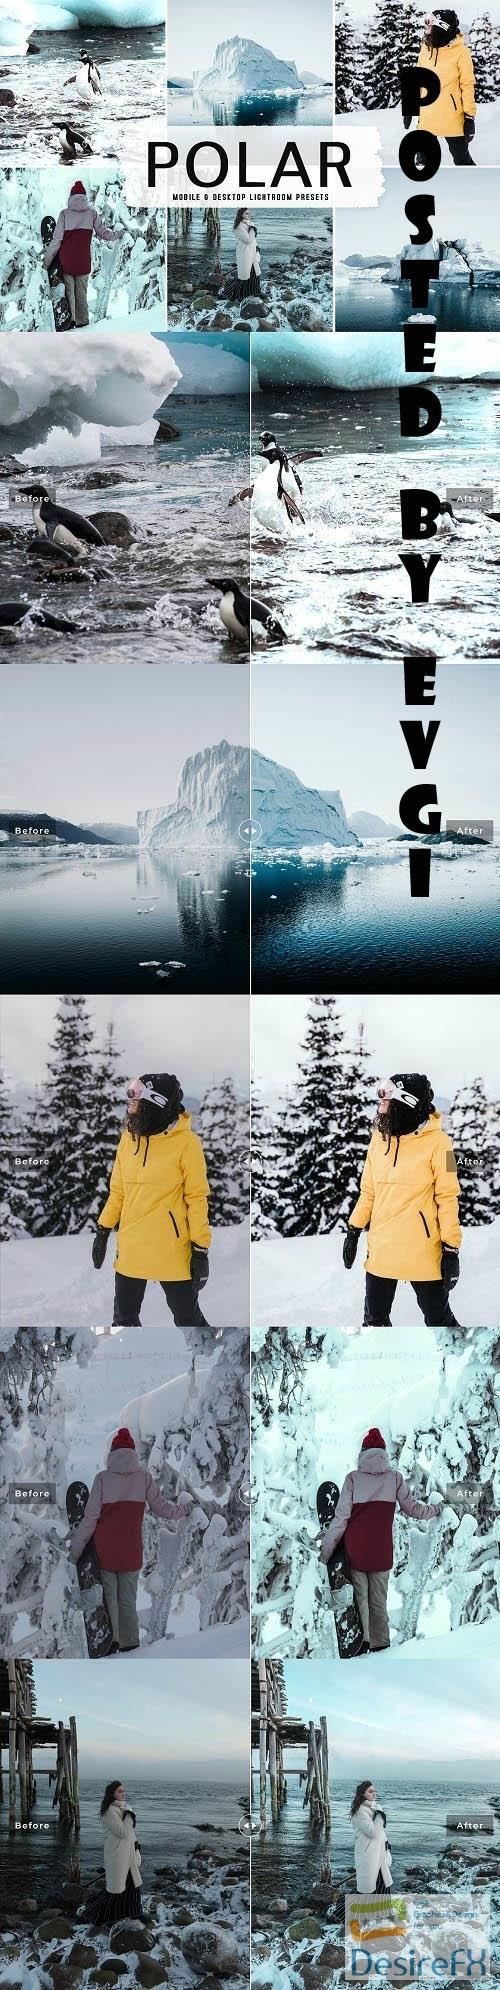 Polar Pro Lightroom Presets - 6339057